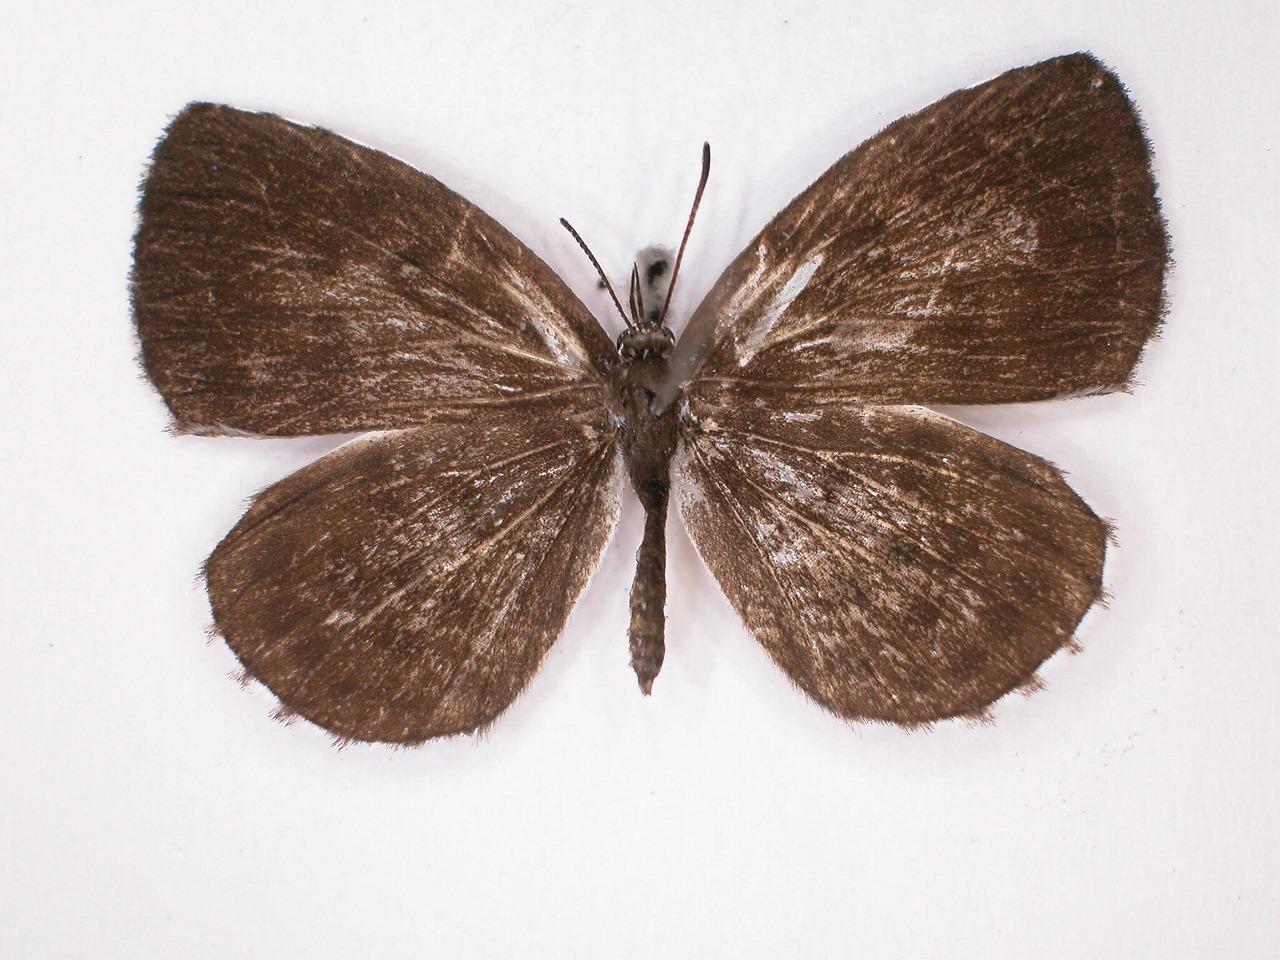 https://www.hitohaku.jp/material/l-material/butterfly-wing/5-lycaenidae/B1-638437_A.jpg